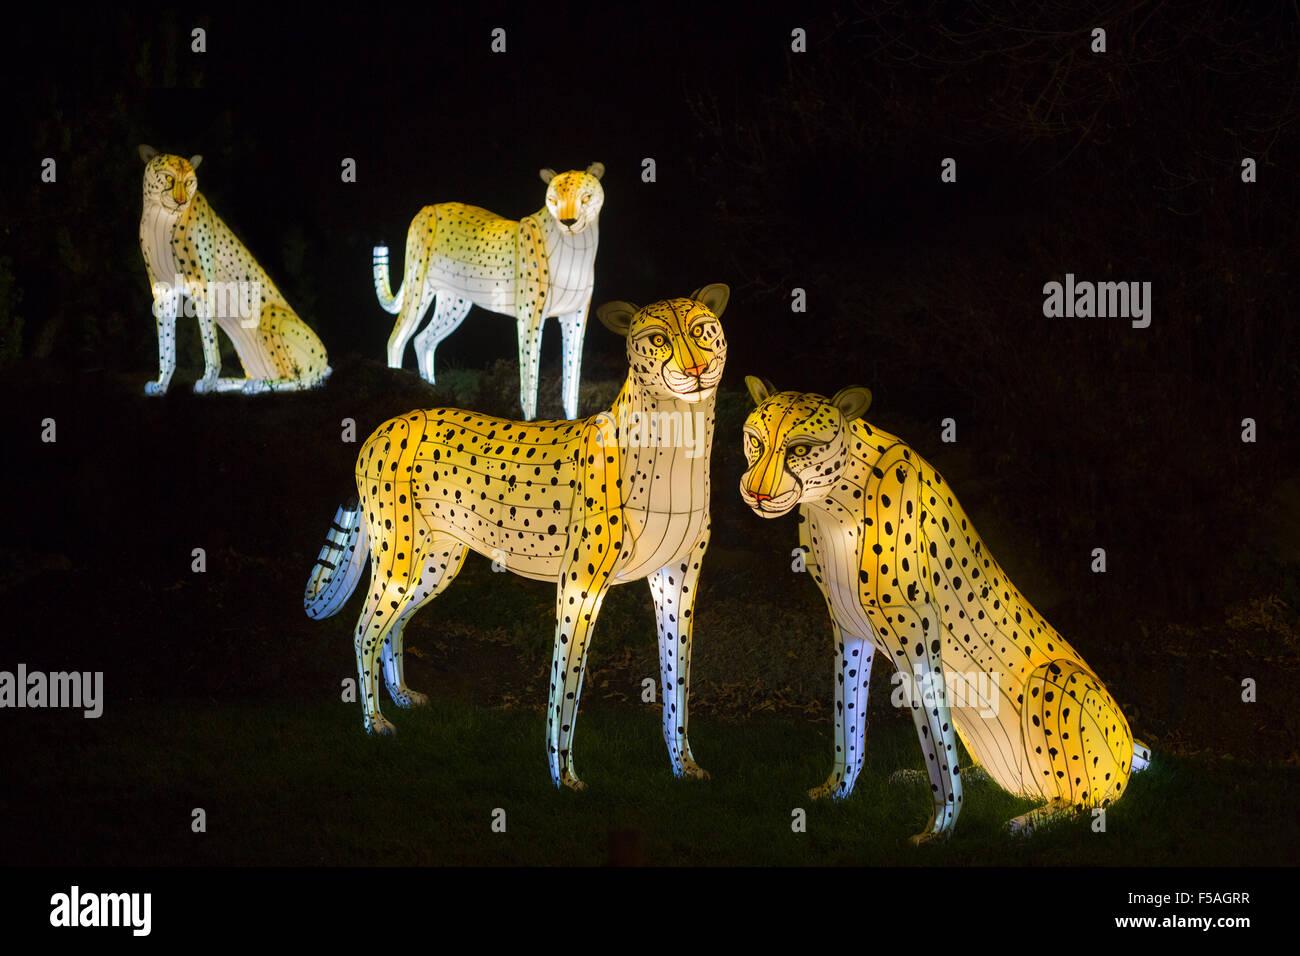 Cheetah lanterns at the Illuminasia Lantern Festival, handmade by Chinese artisans,  powered by energy efficient - Stock Image